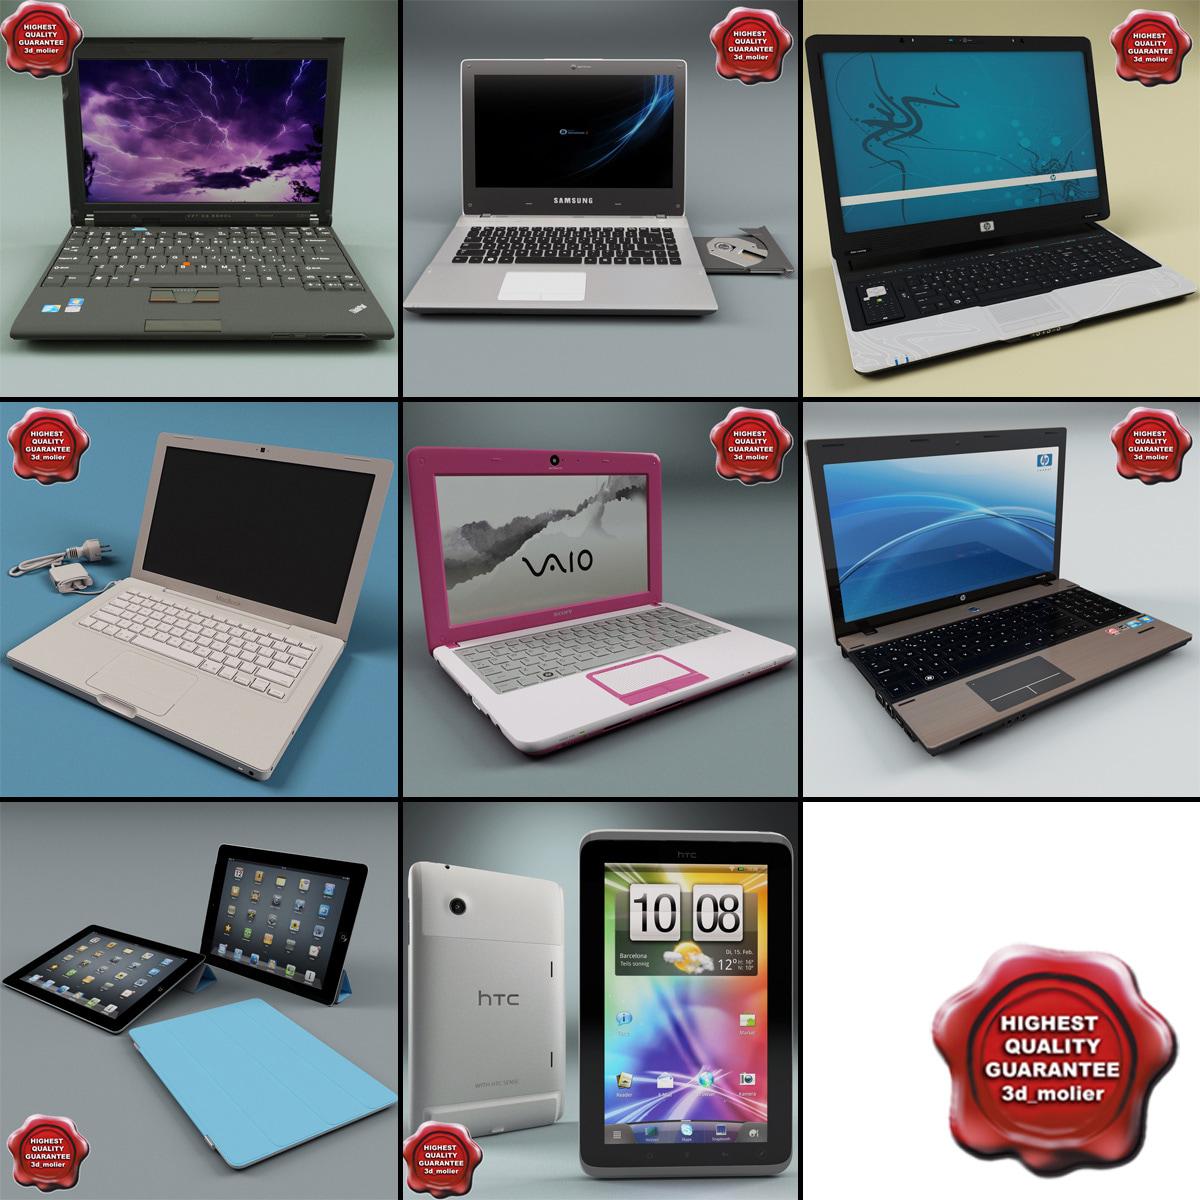 Laptops_Collection_V3_000.jpg